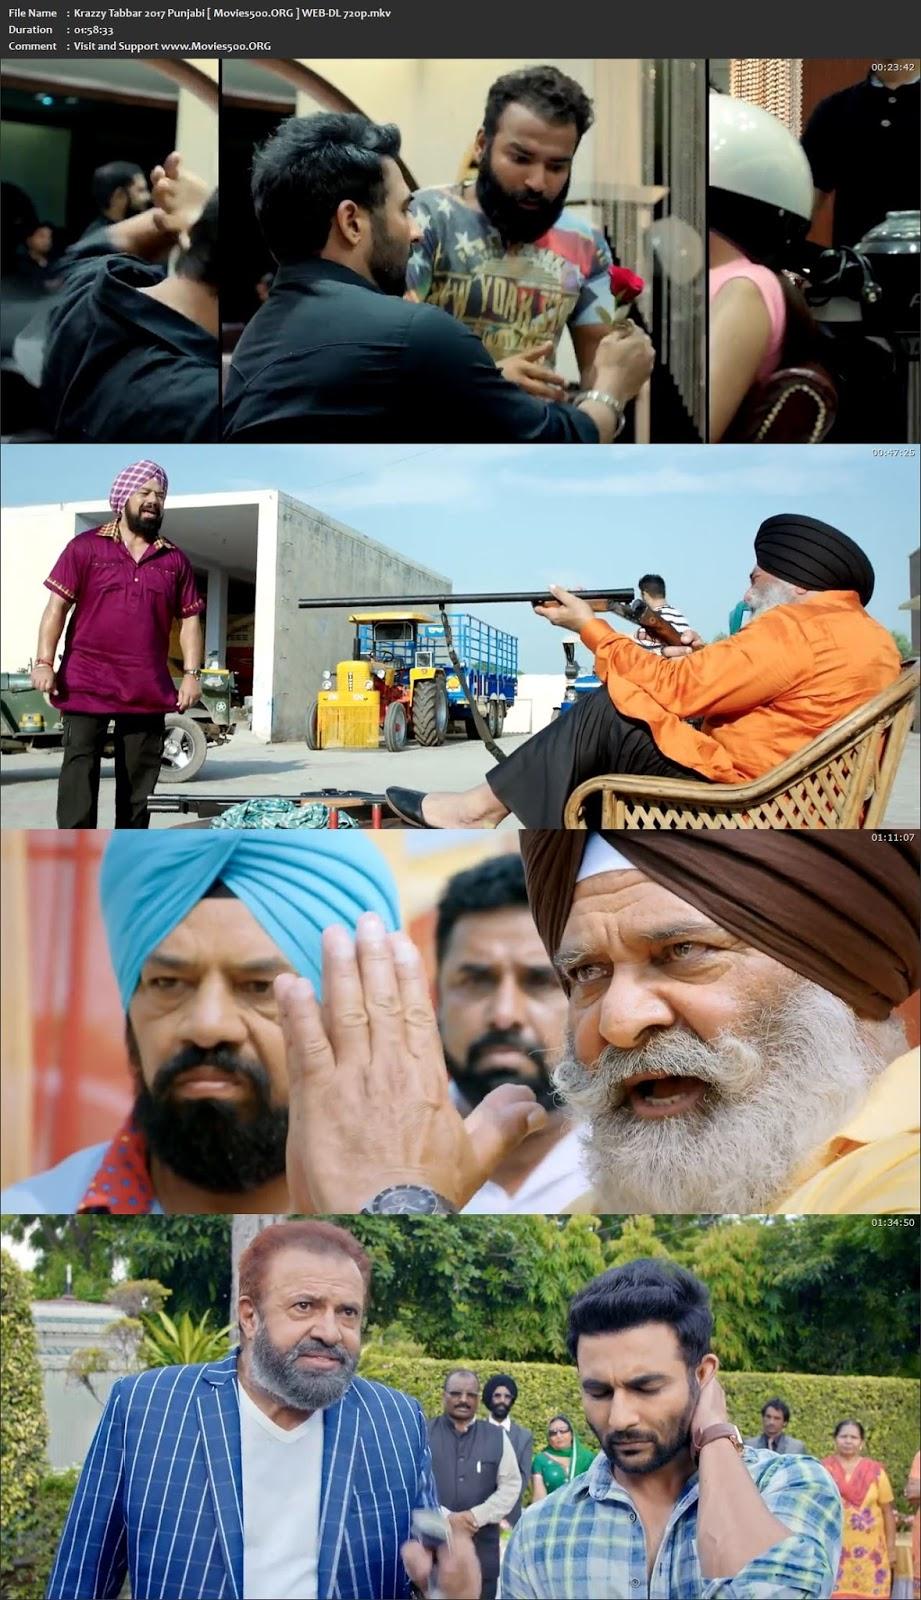 Krazzy Tabbar 2017 Punjabi Full Movie WEB DL 720p